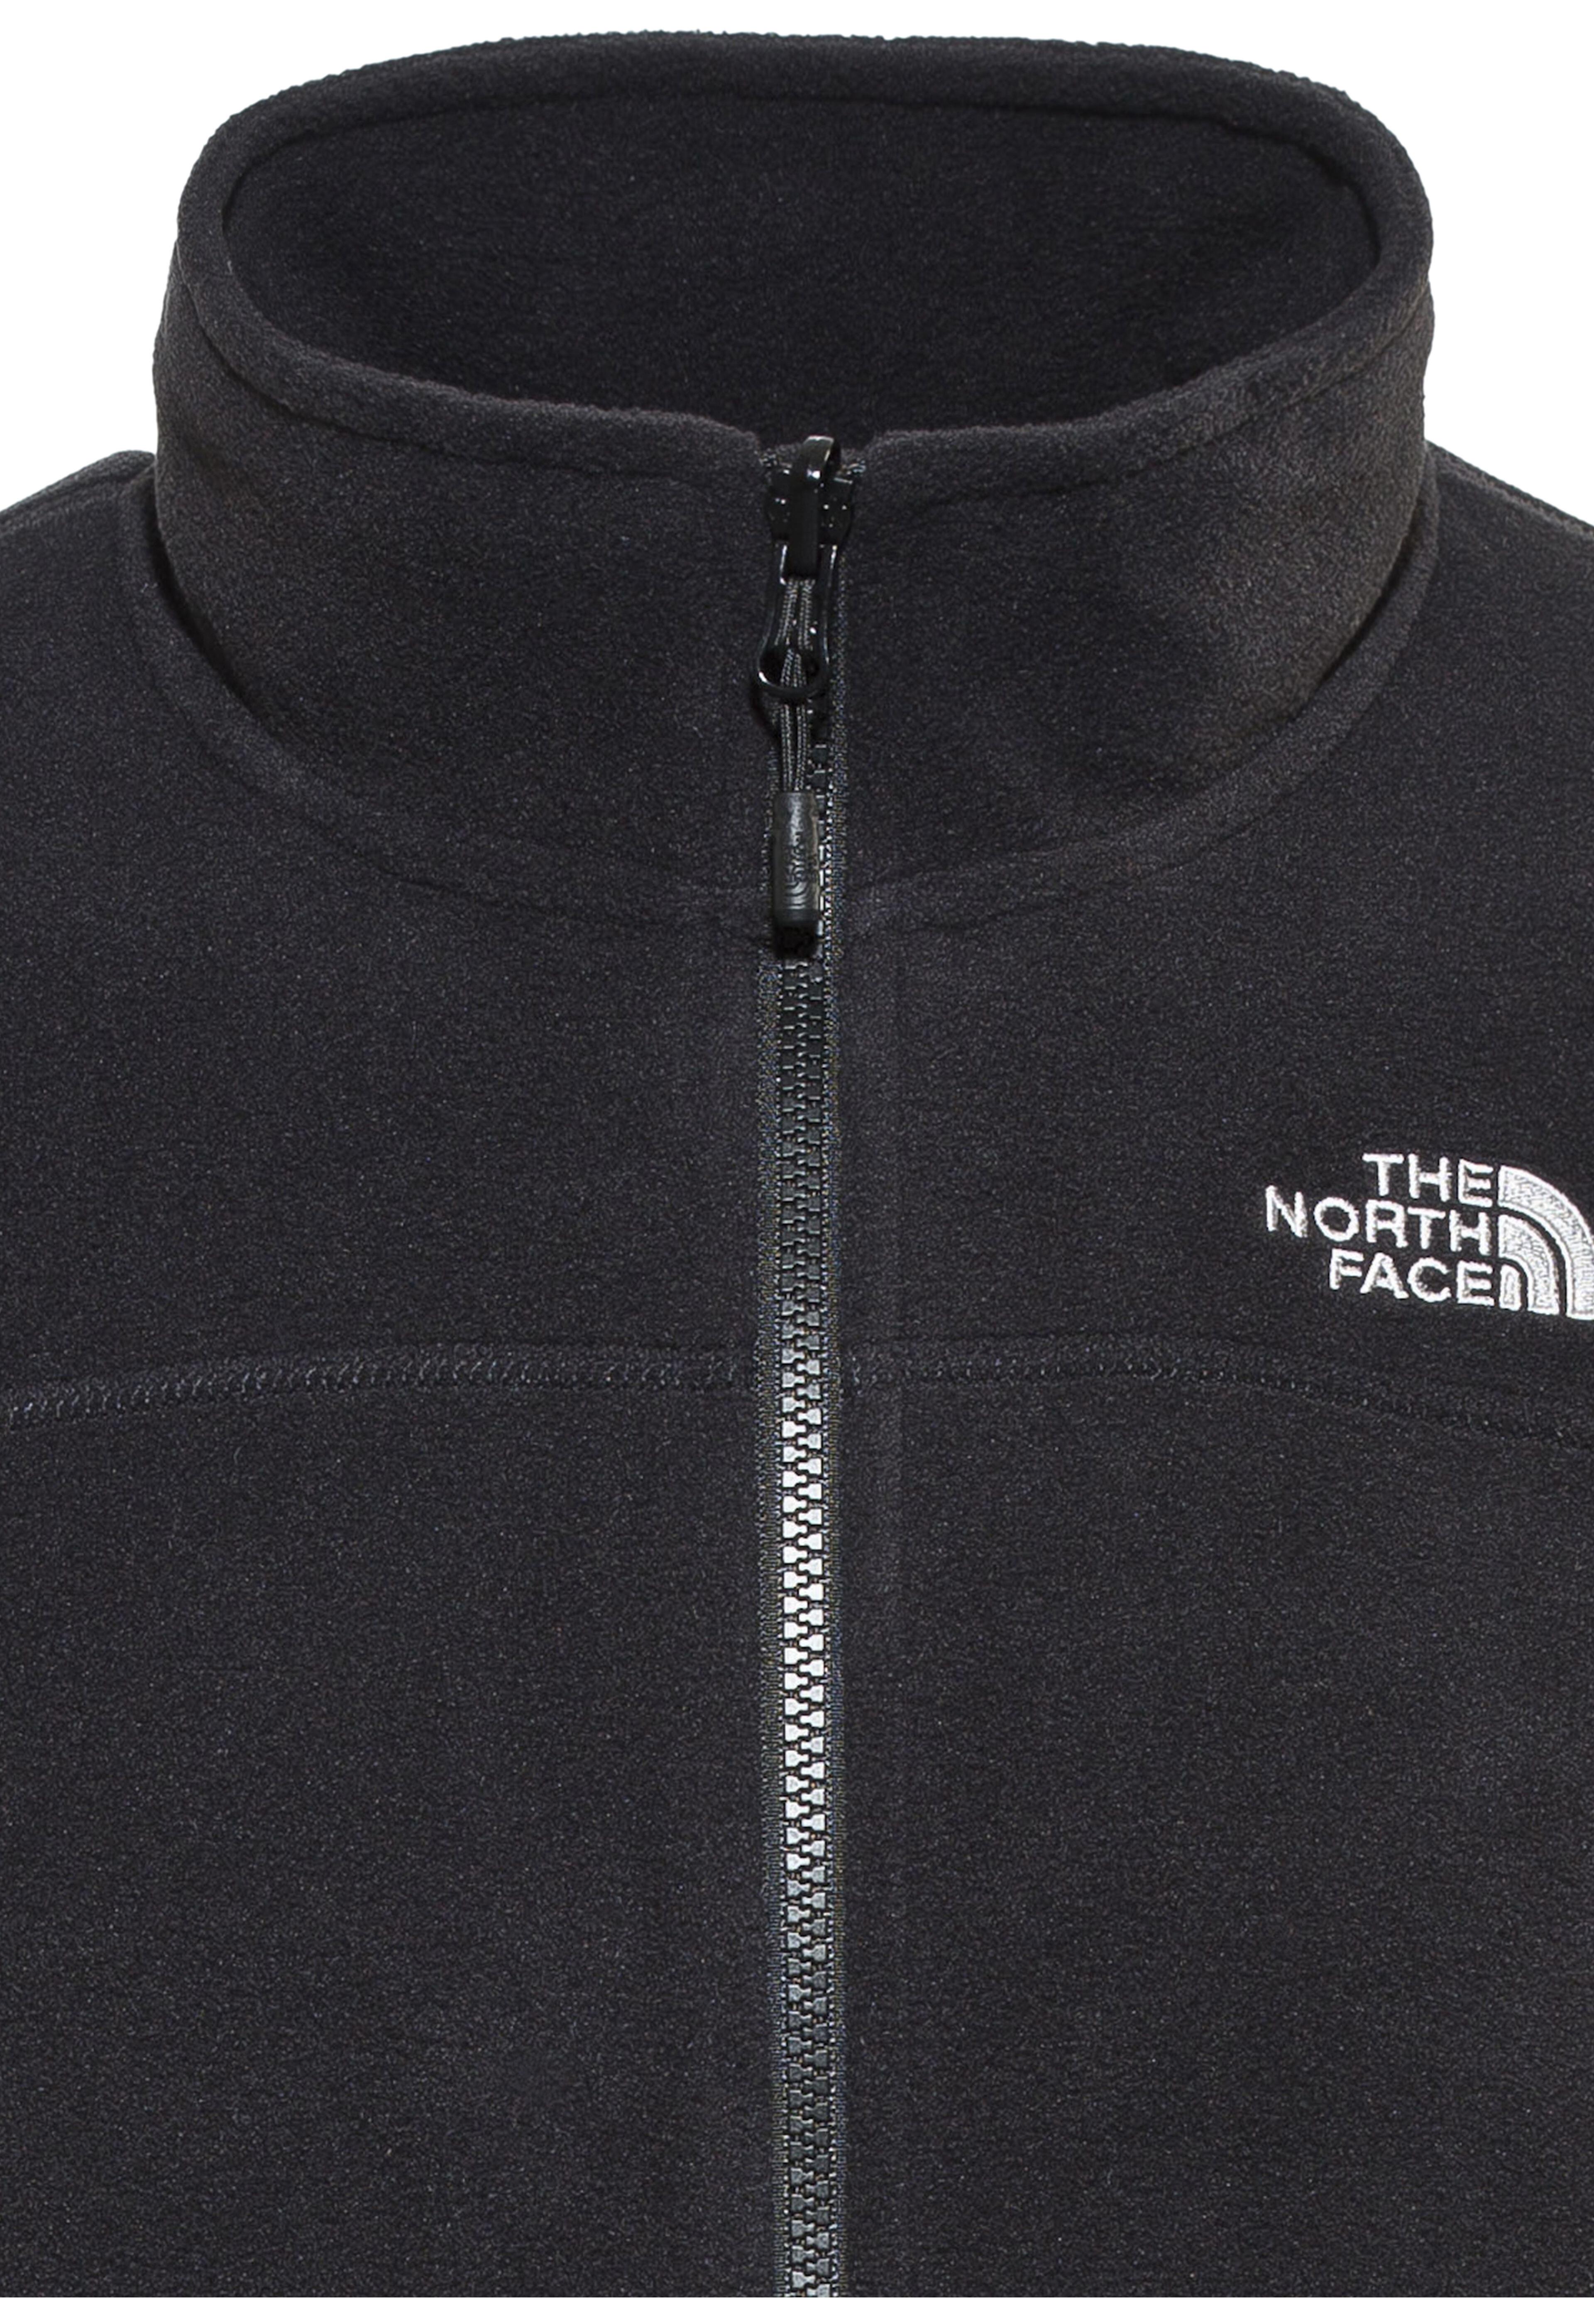 286c07717044a The North Face 100 Glacier Hombre - Chaqueta - negro